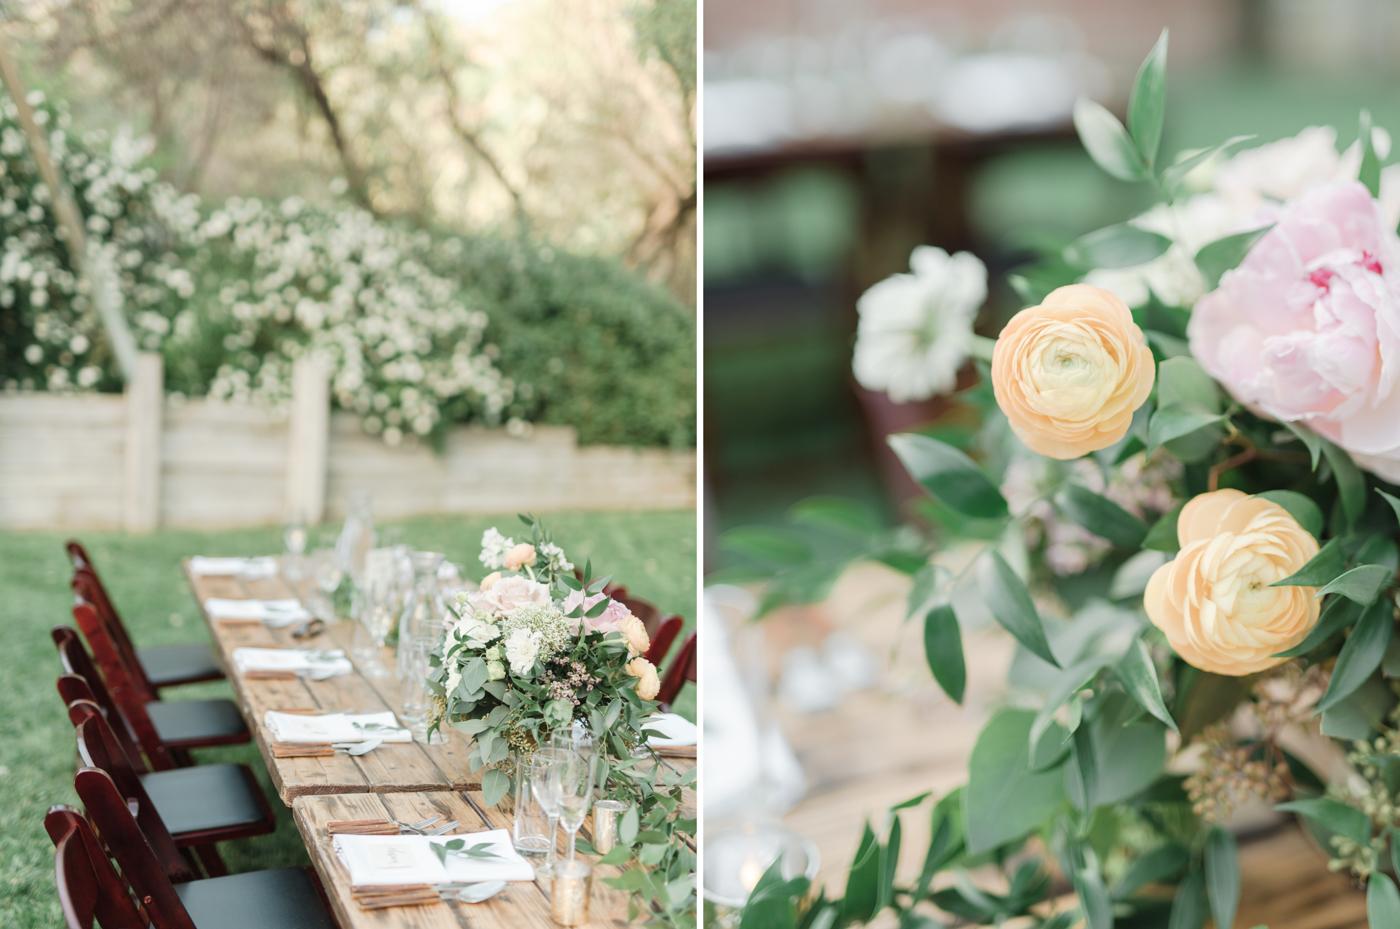 l&c-the_1909_spring_garden_wedding_los_angeles_fine_art_wedding_photographer-29.jpg